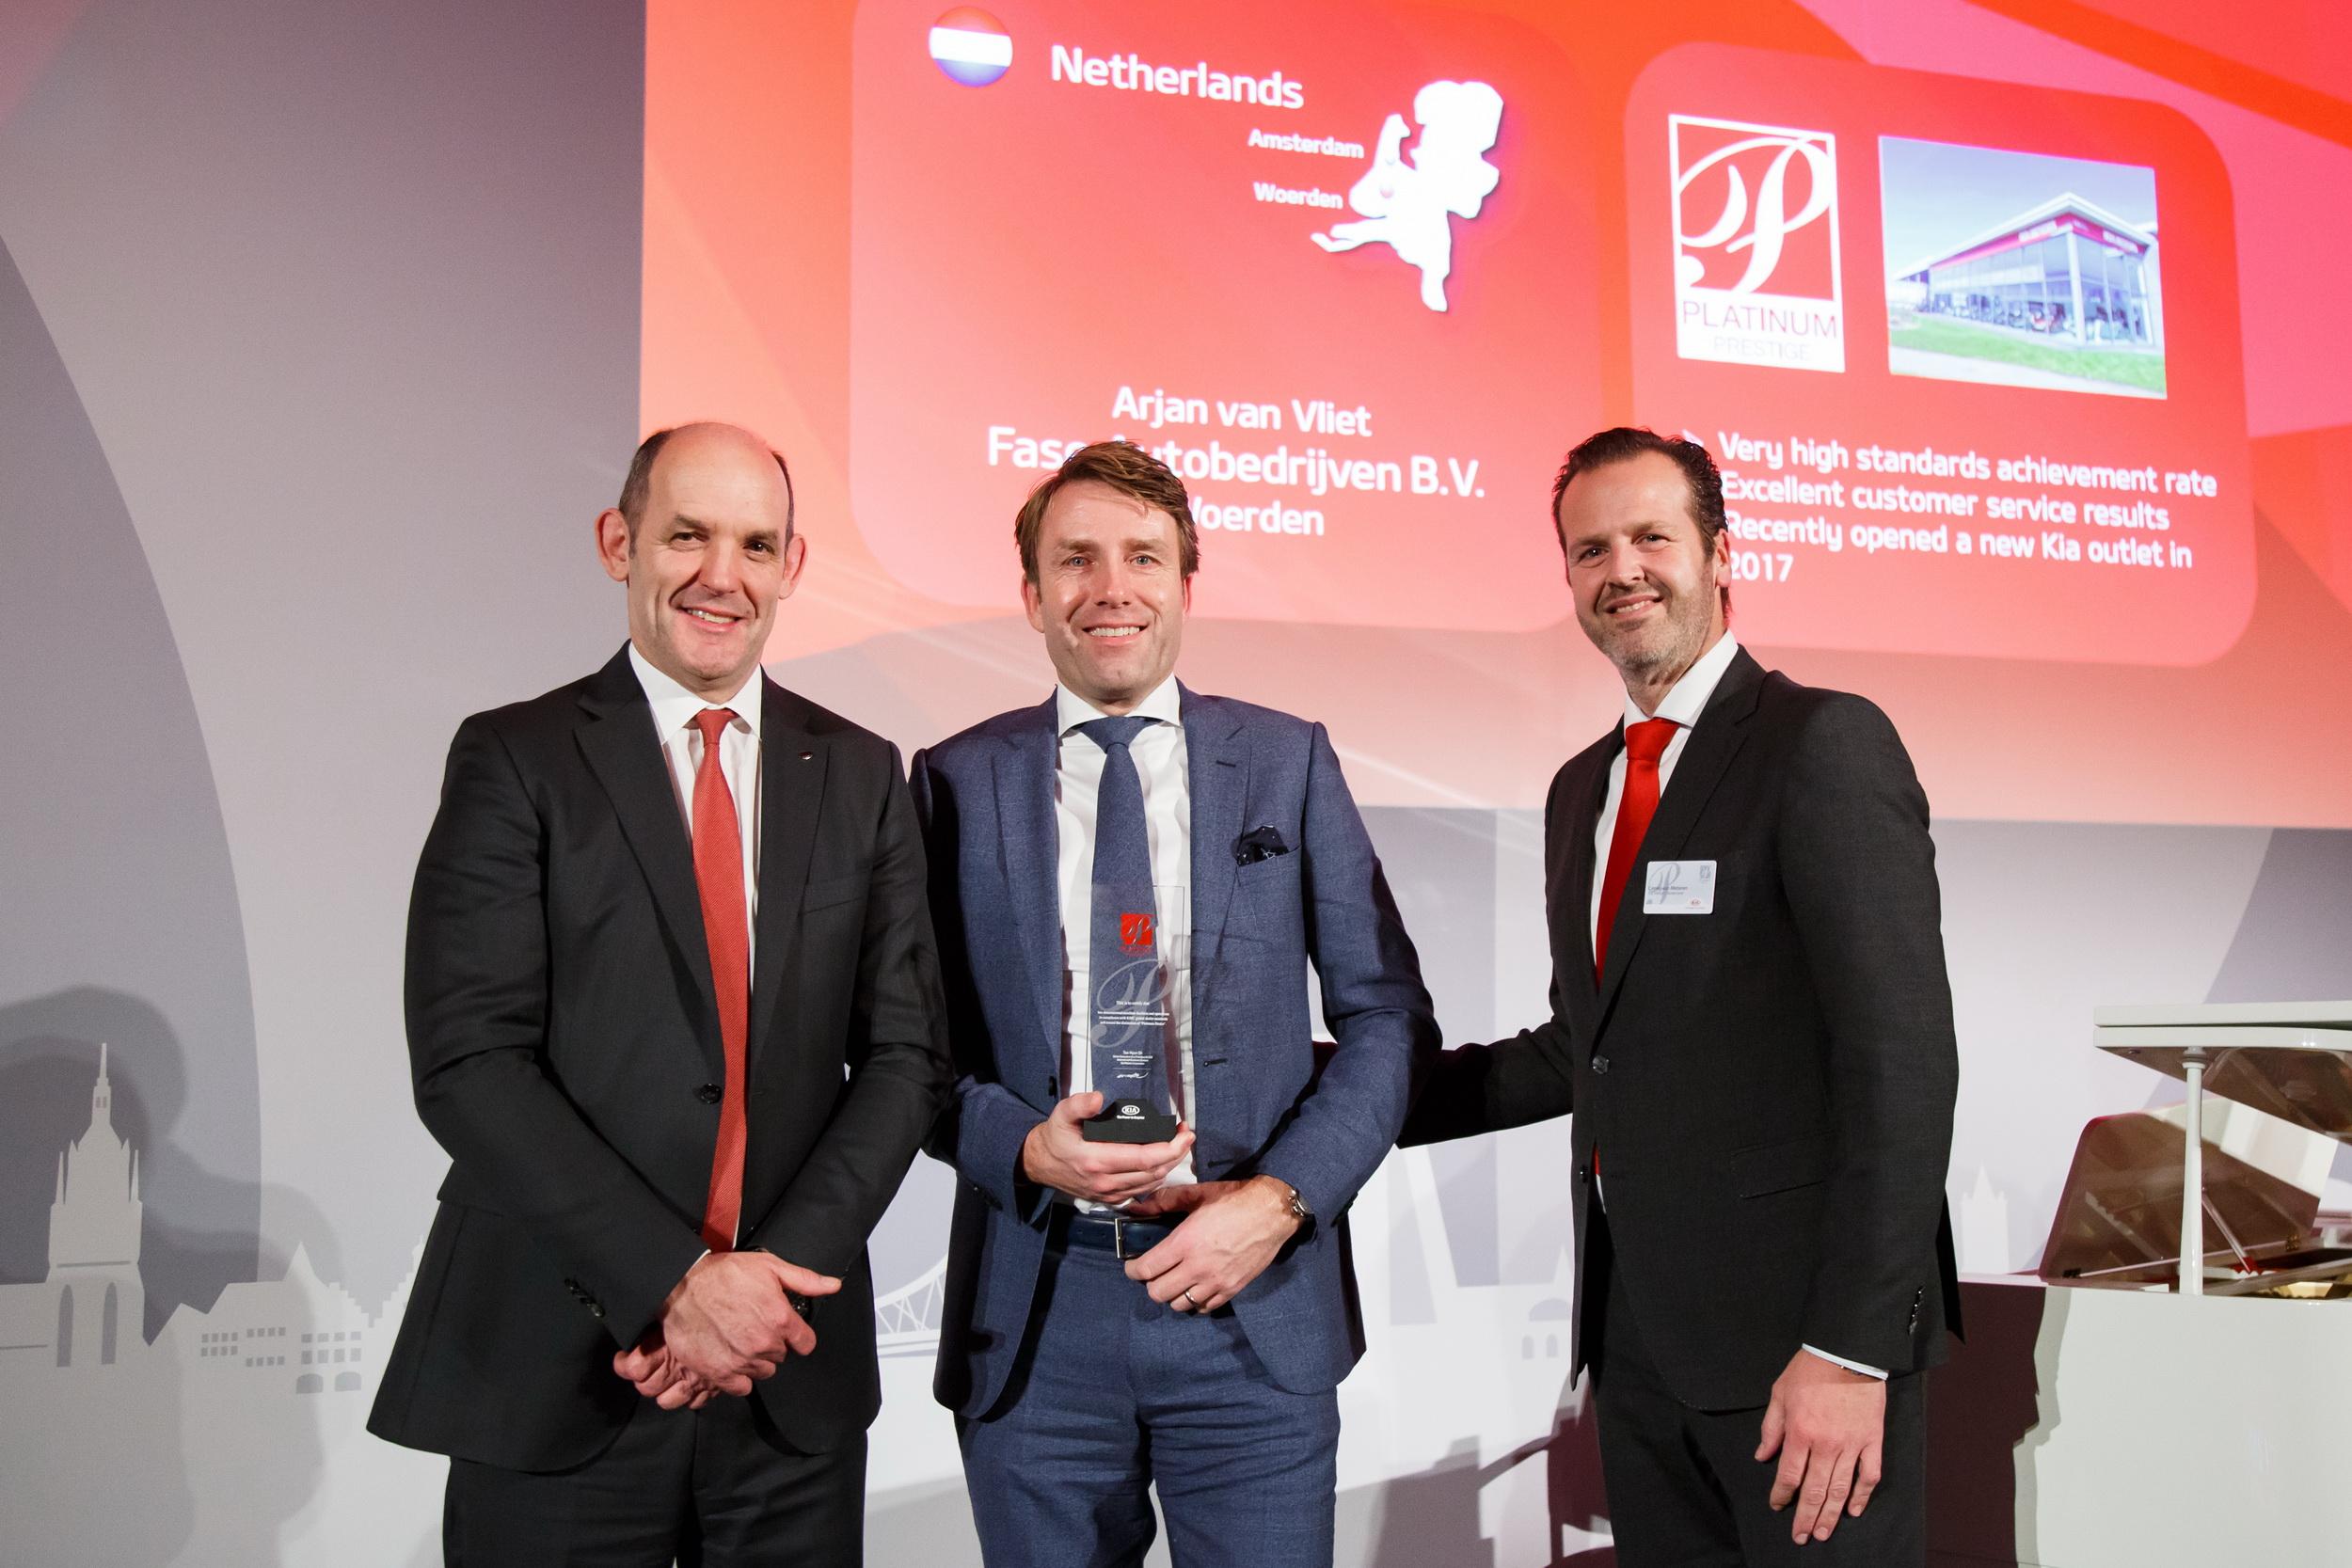 Fase Autobedrijven bekroond met Platinum Prestige Dealer Award 2018